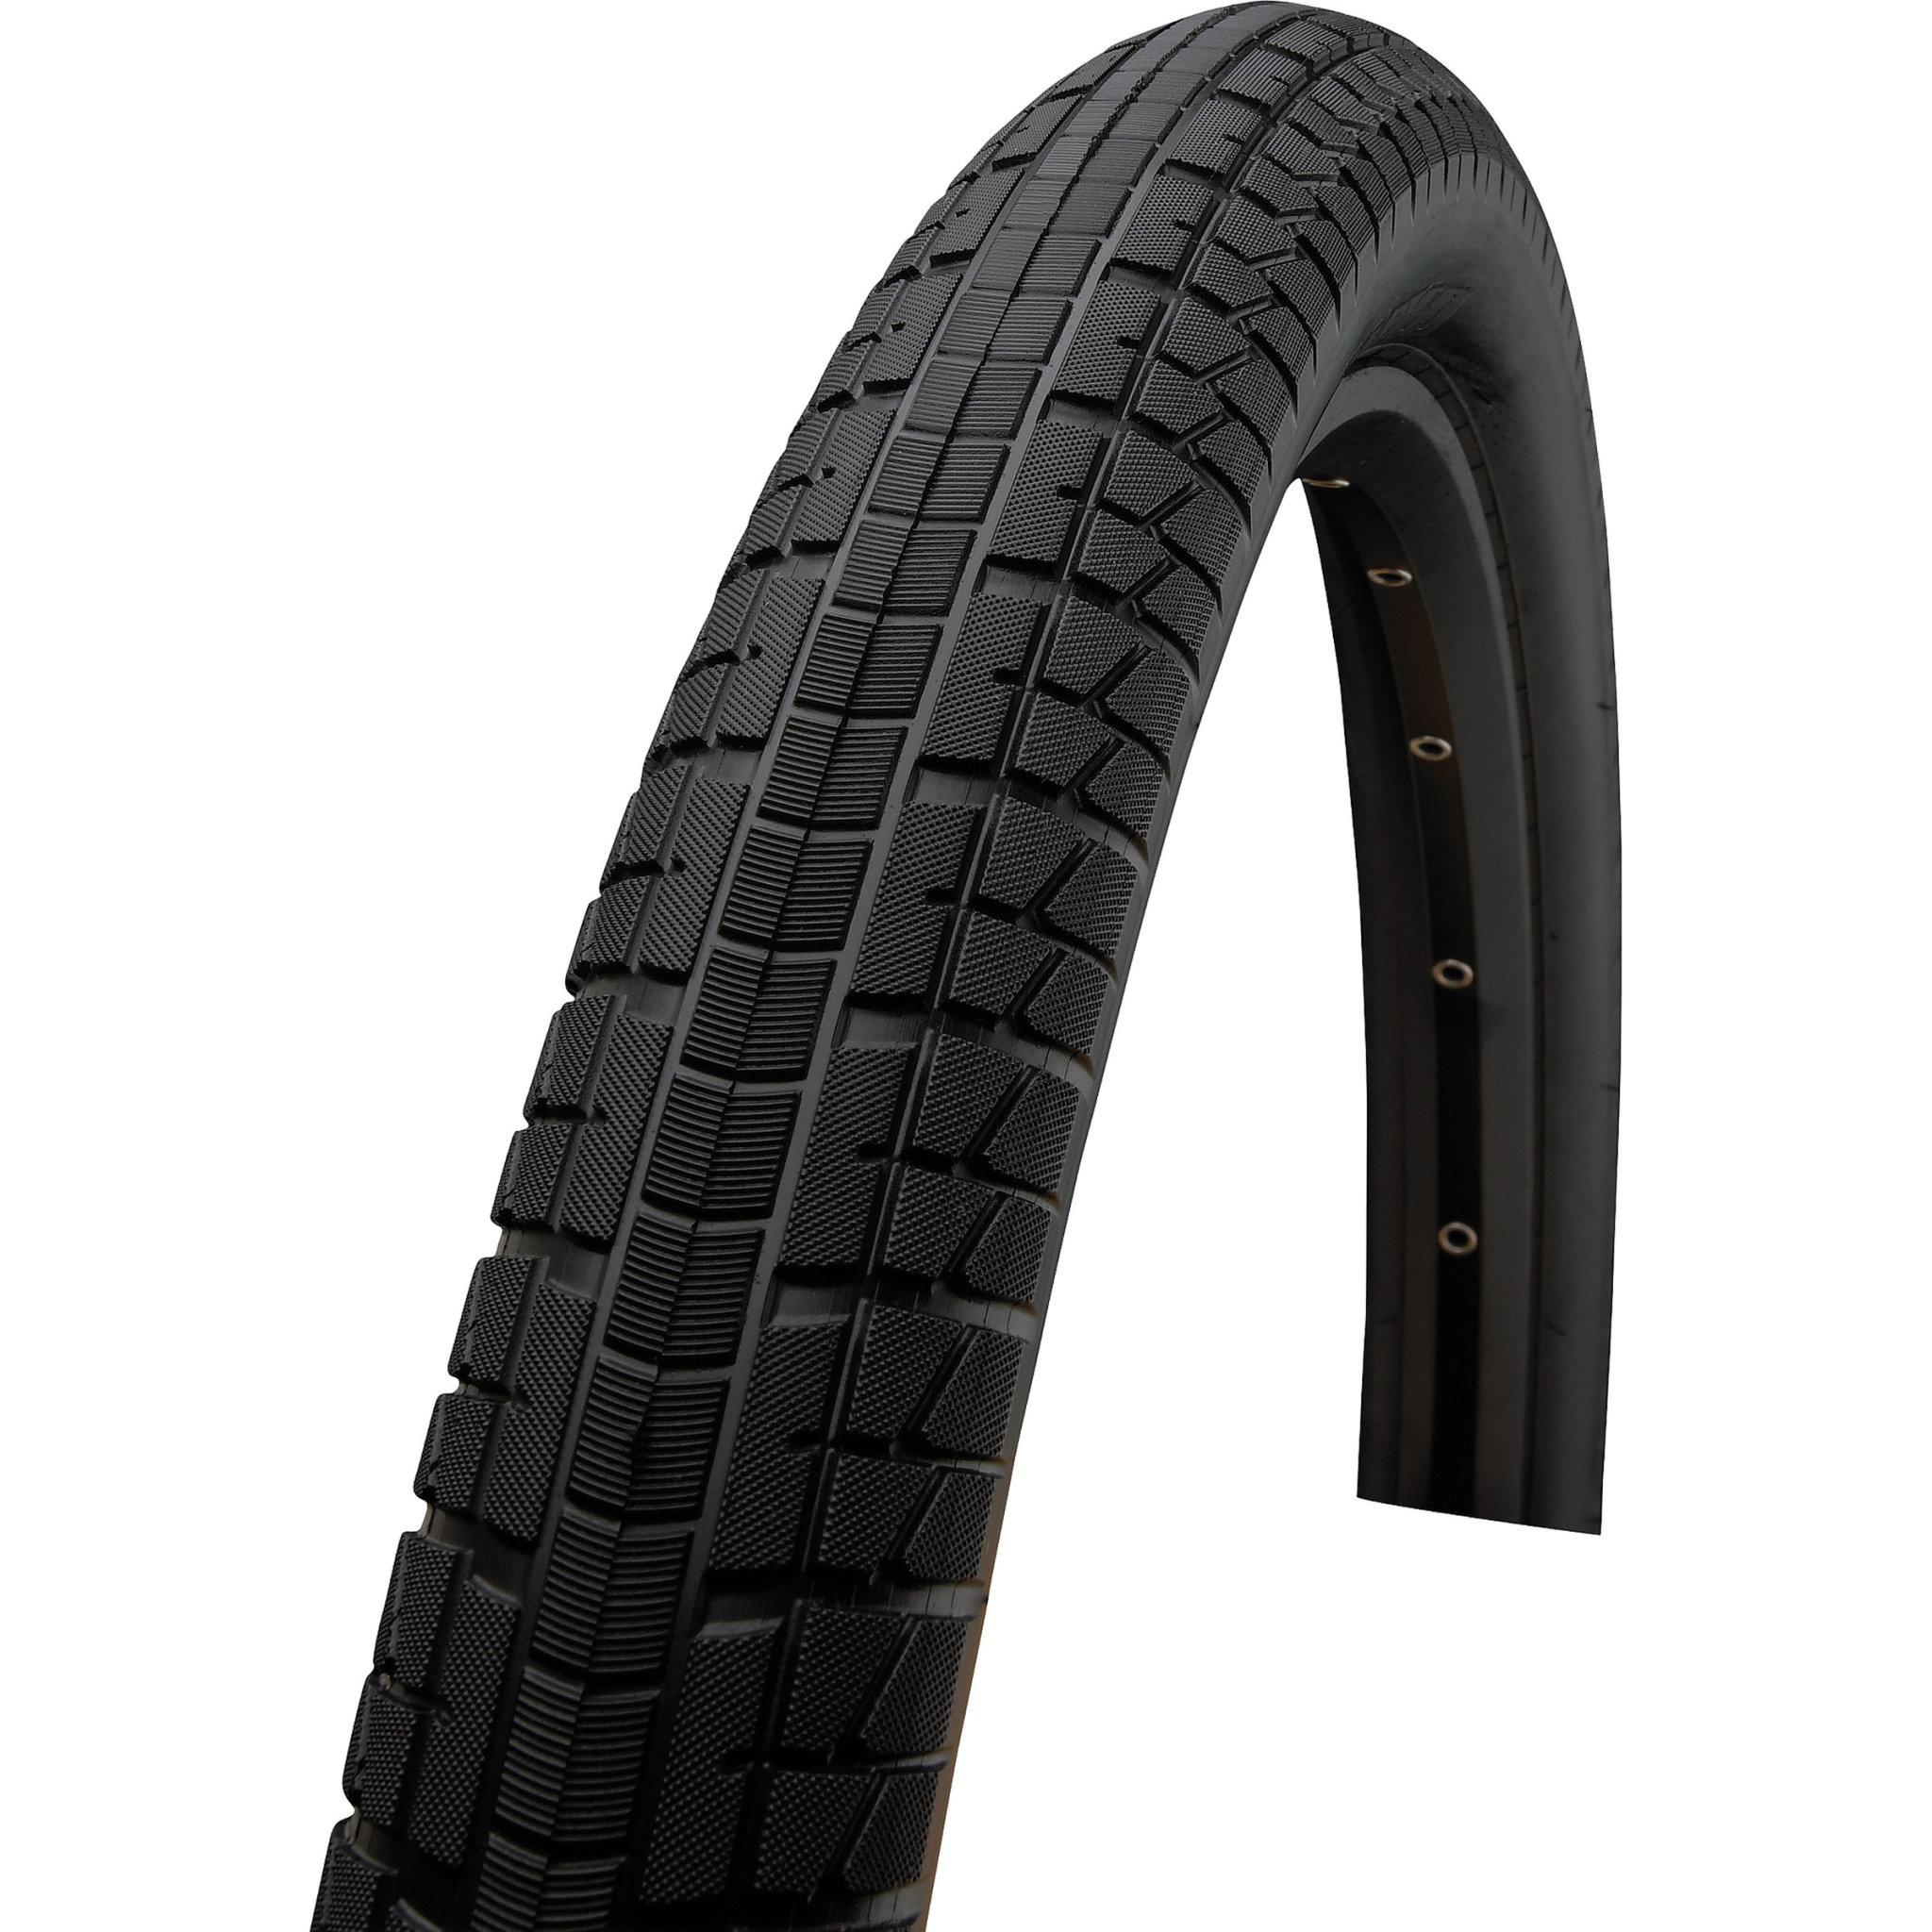 Specialized Specialized Compound Wire Bead Tire, 24x2.2